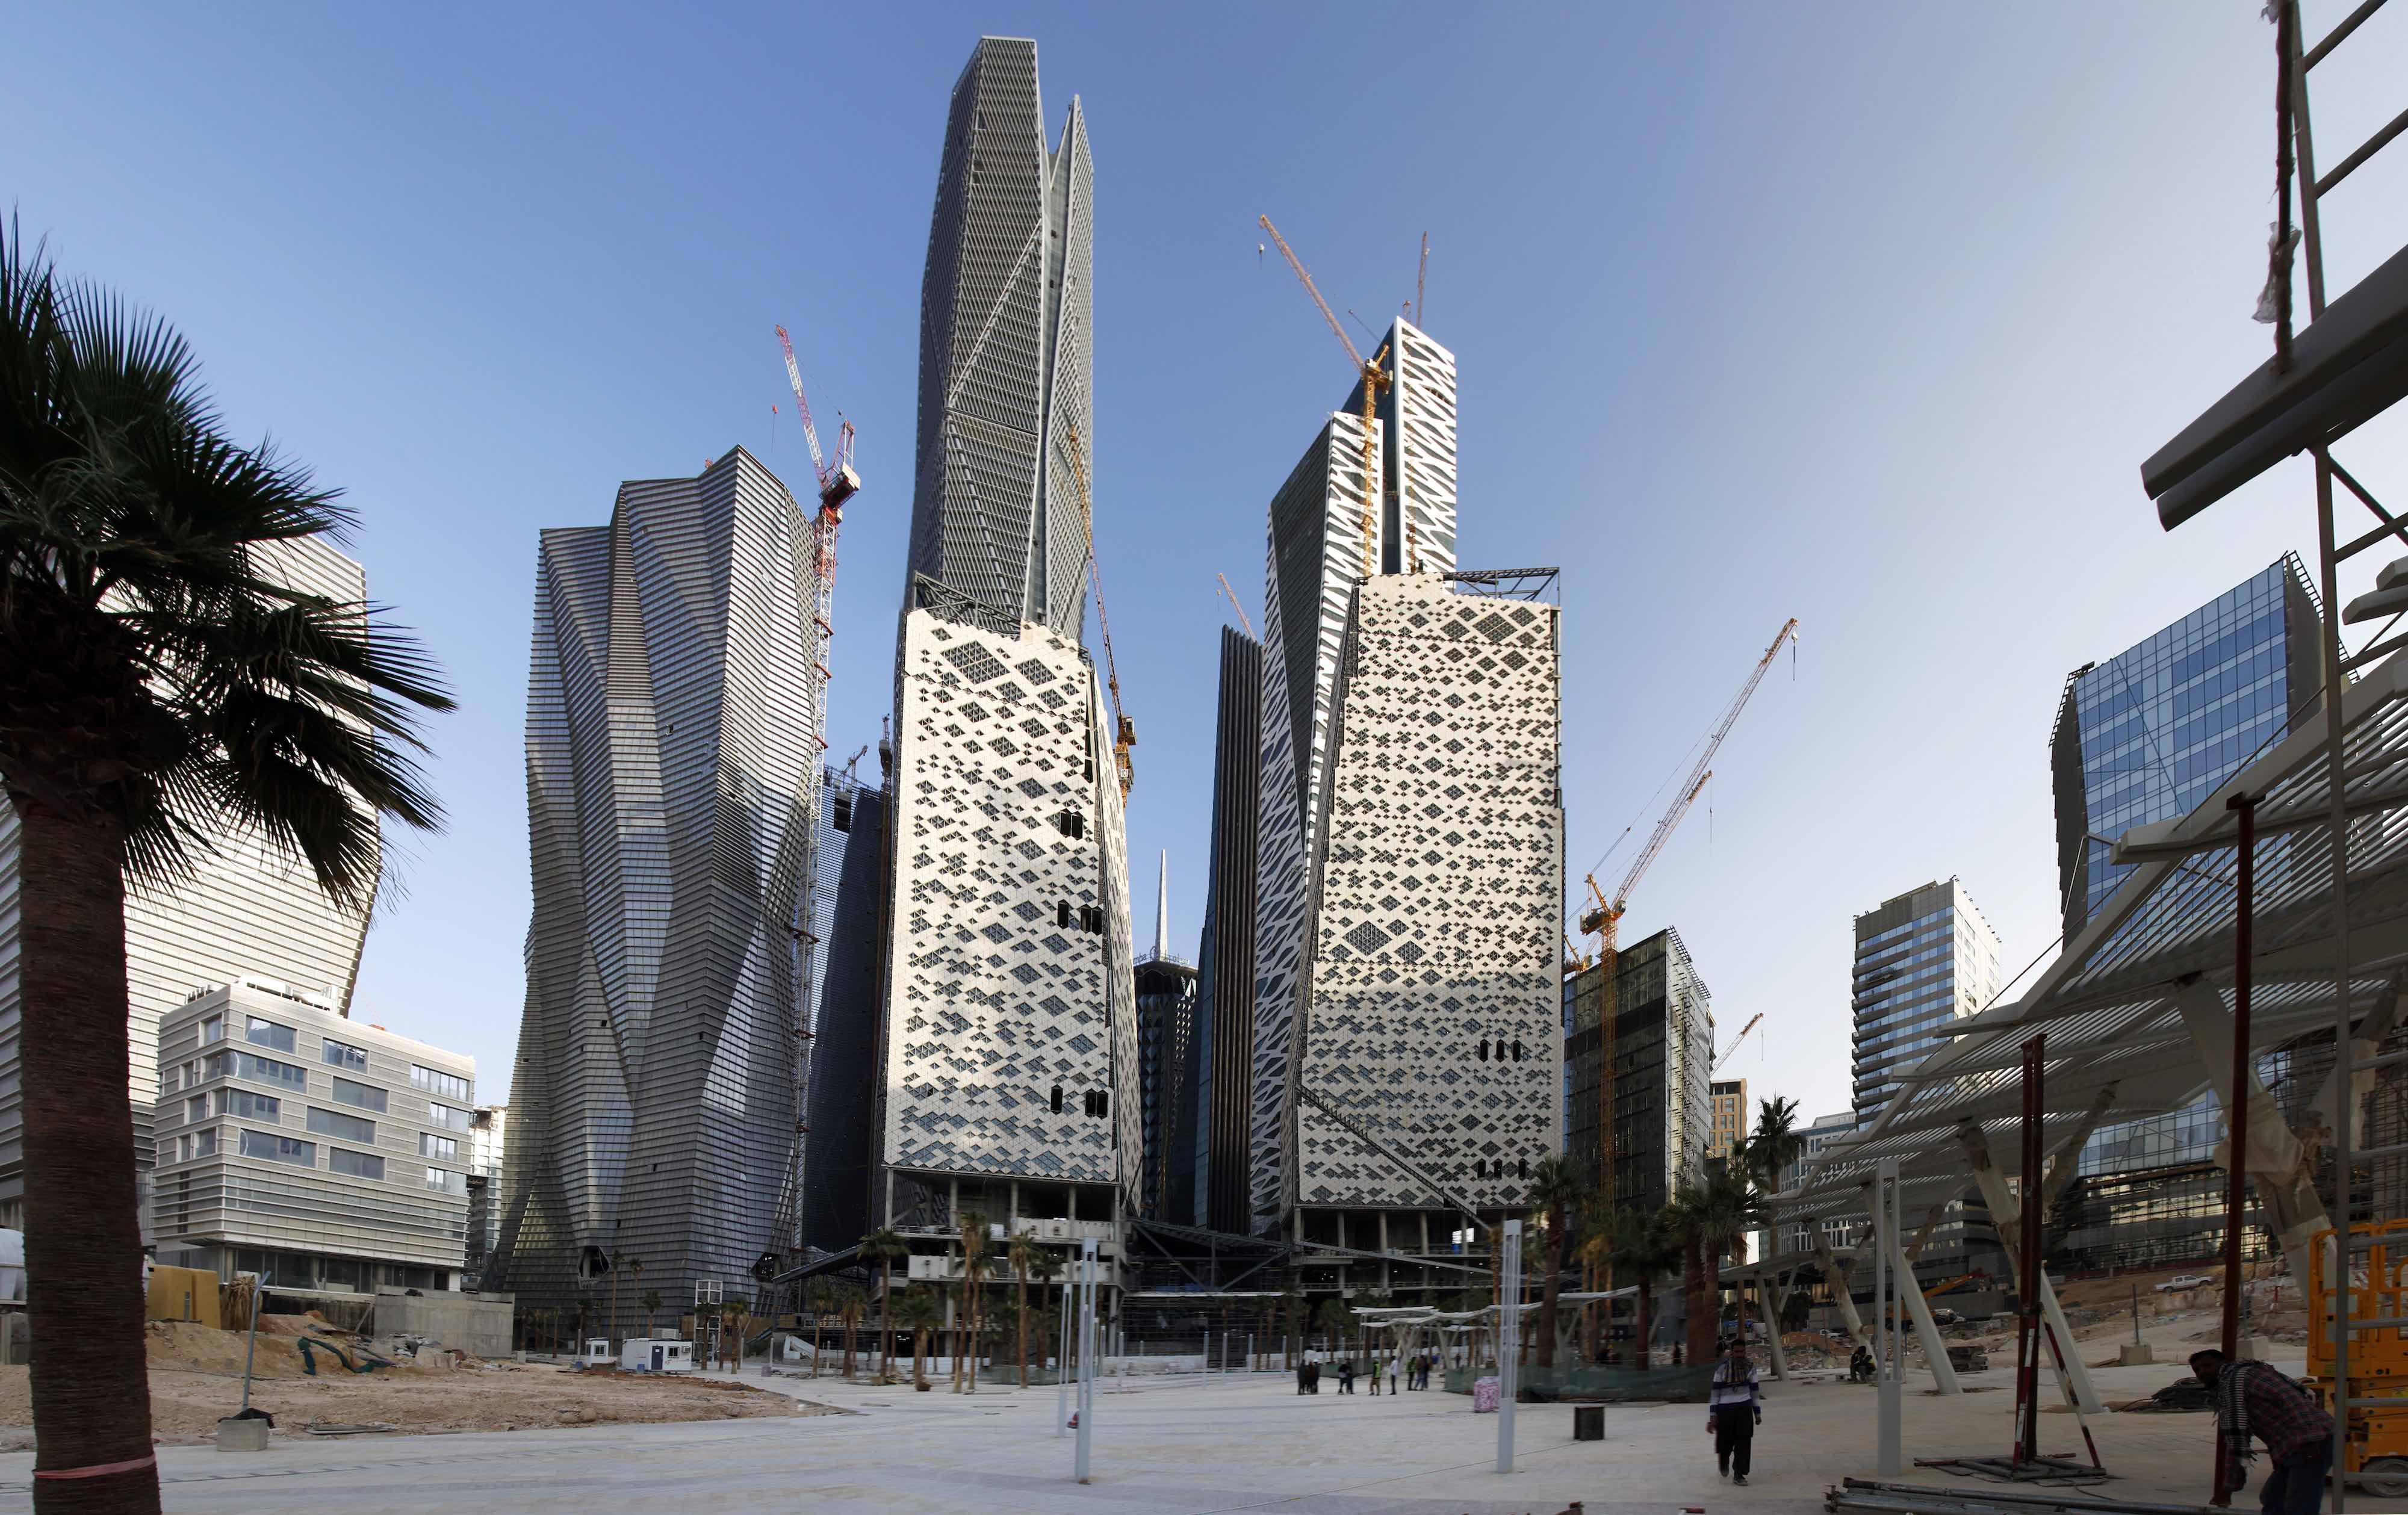 King Abdullah Financial District by Henning Larsen Architects